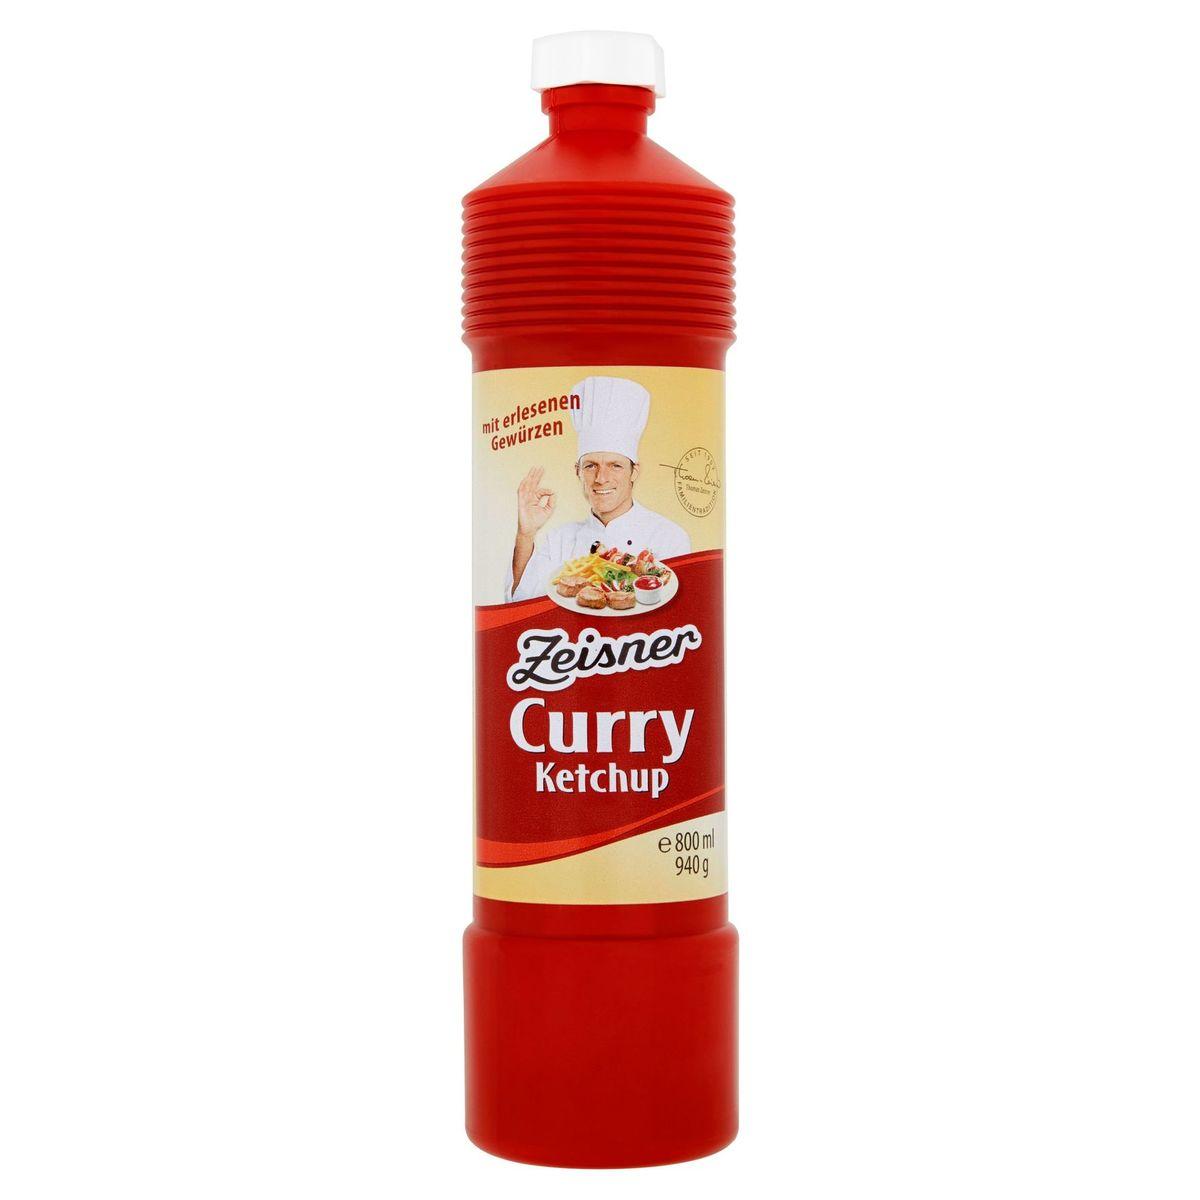 Zeisner Curry Ketchup 940 g